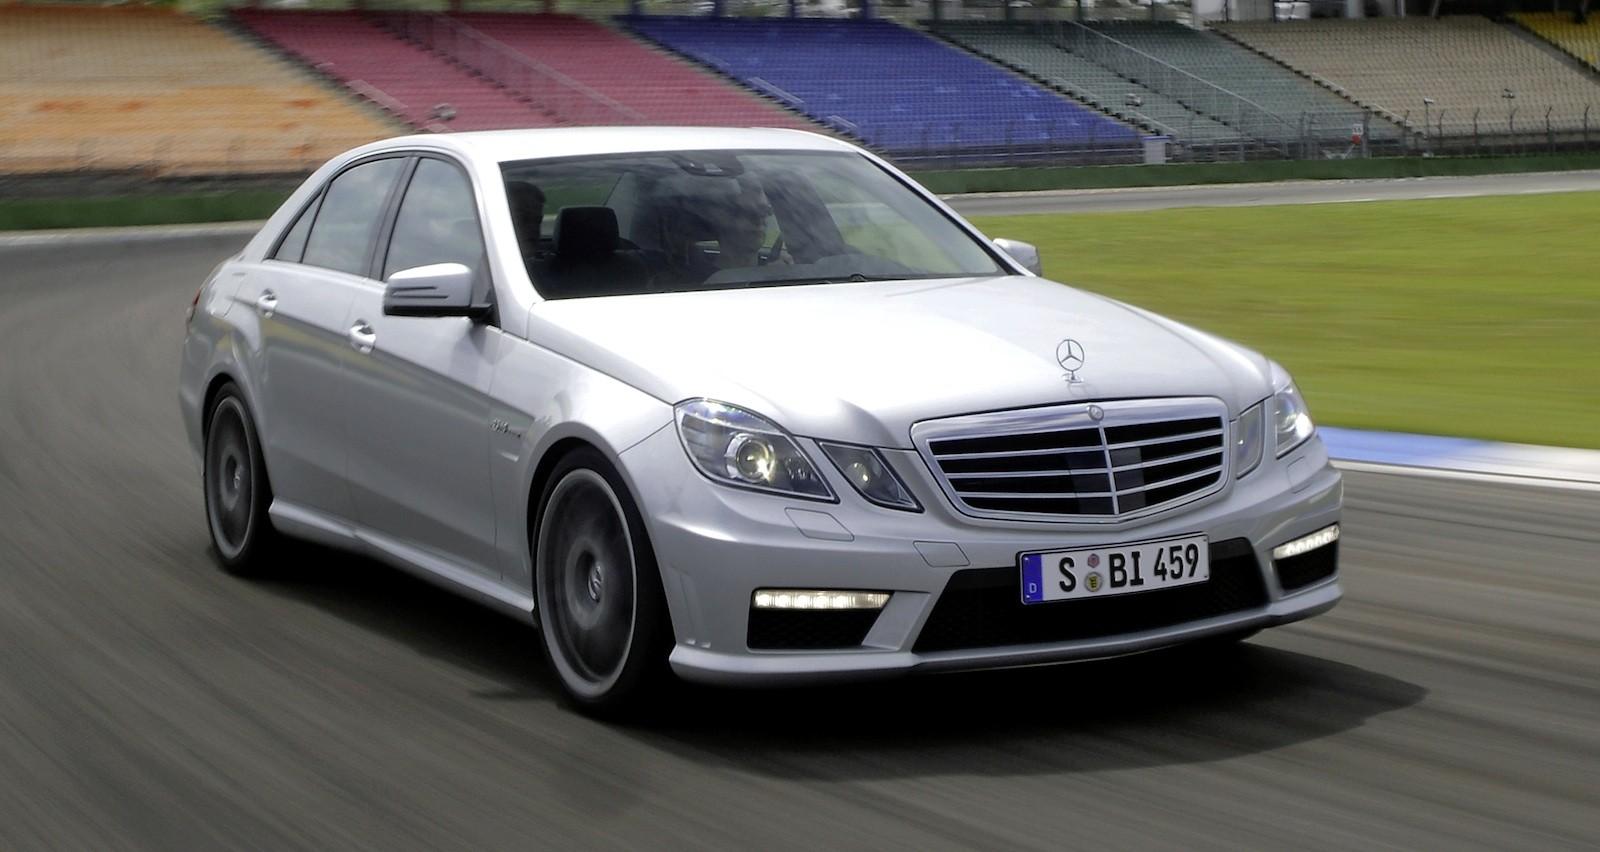 Mercedes benz amg racers to enter v8 supercars photos 1 for New mercedes benz supercar